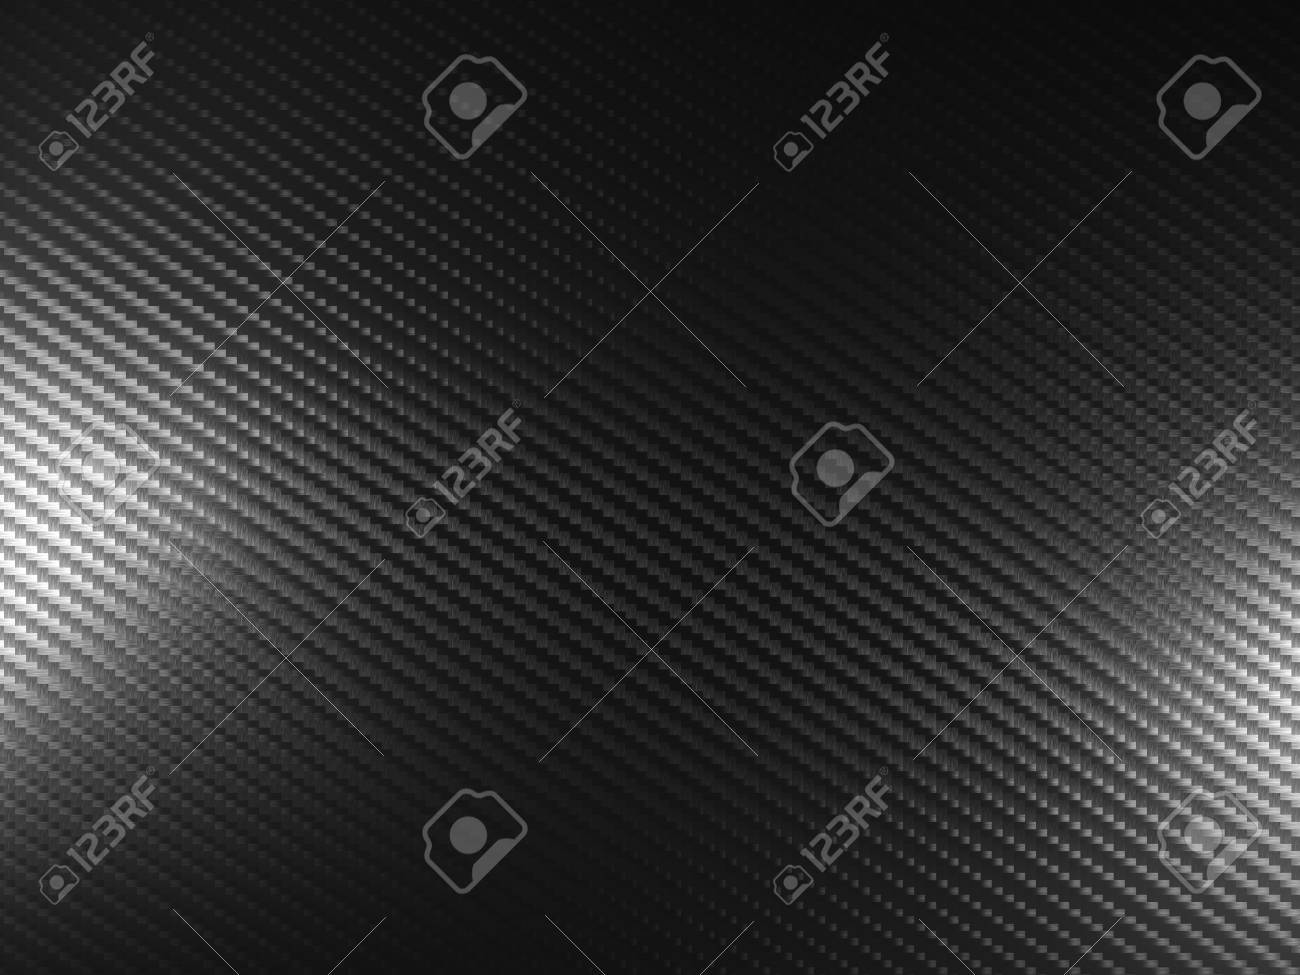 3d image of classic carbon fiber texture - 42873200